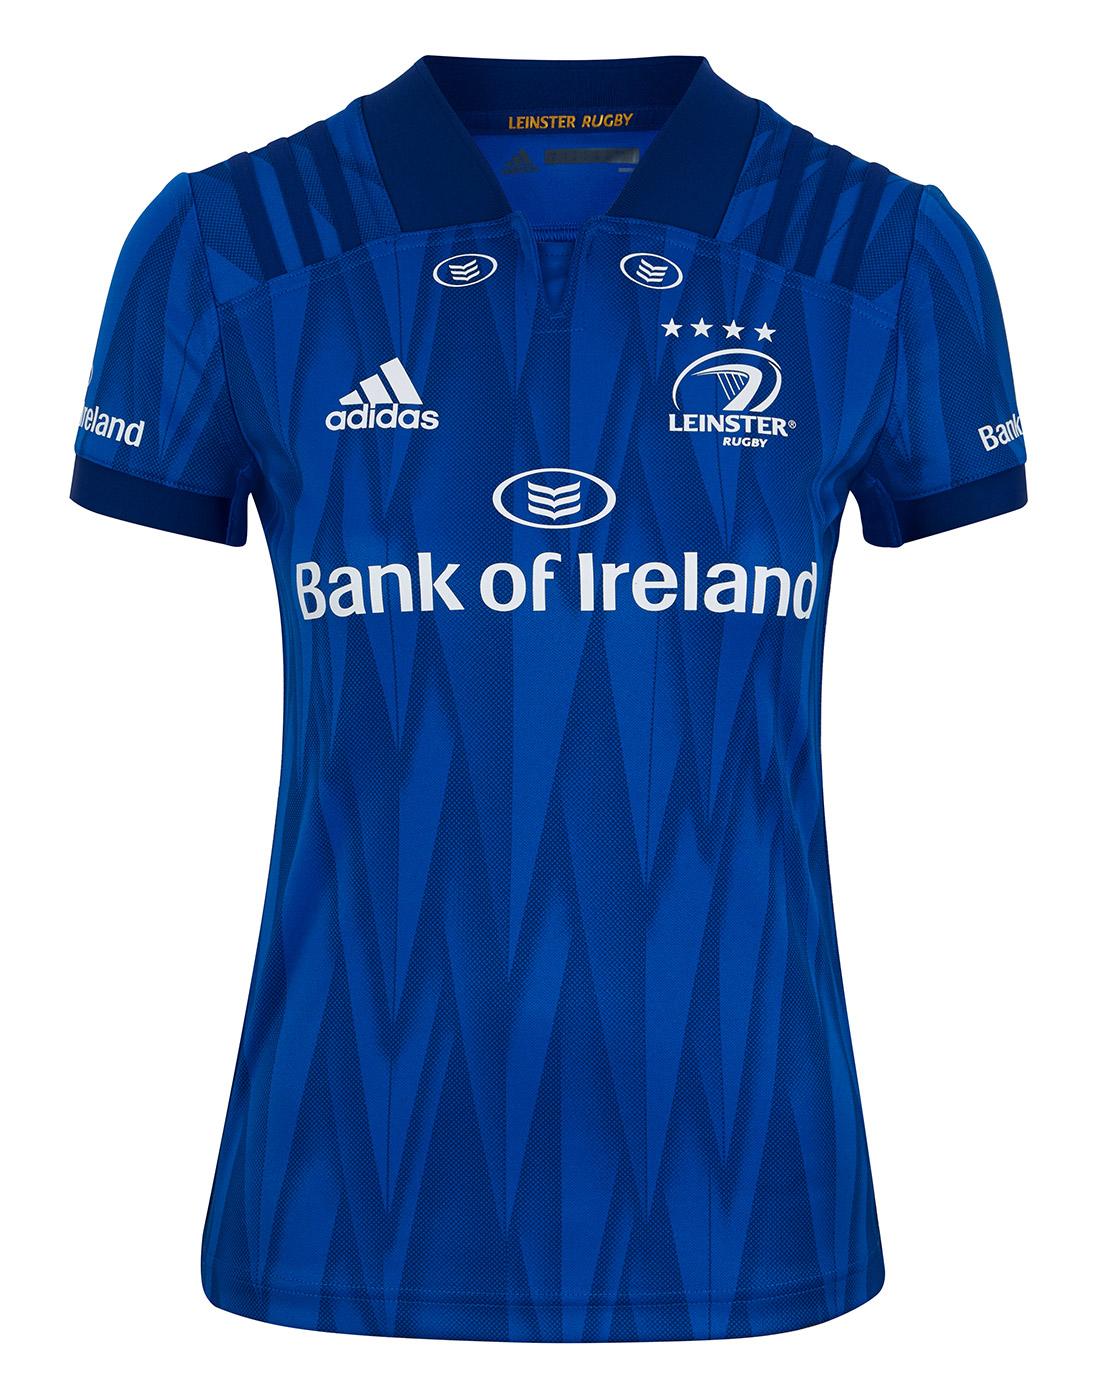 punto final Desanimarse hada  Ladies Leinster 2019 Home Jersey | adidas | Life Style Sports